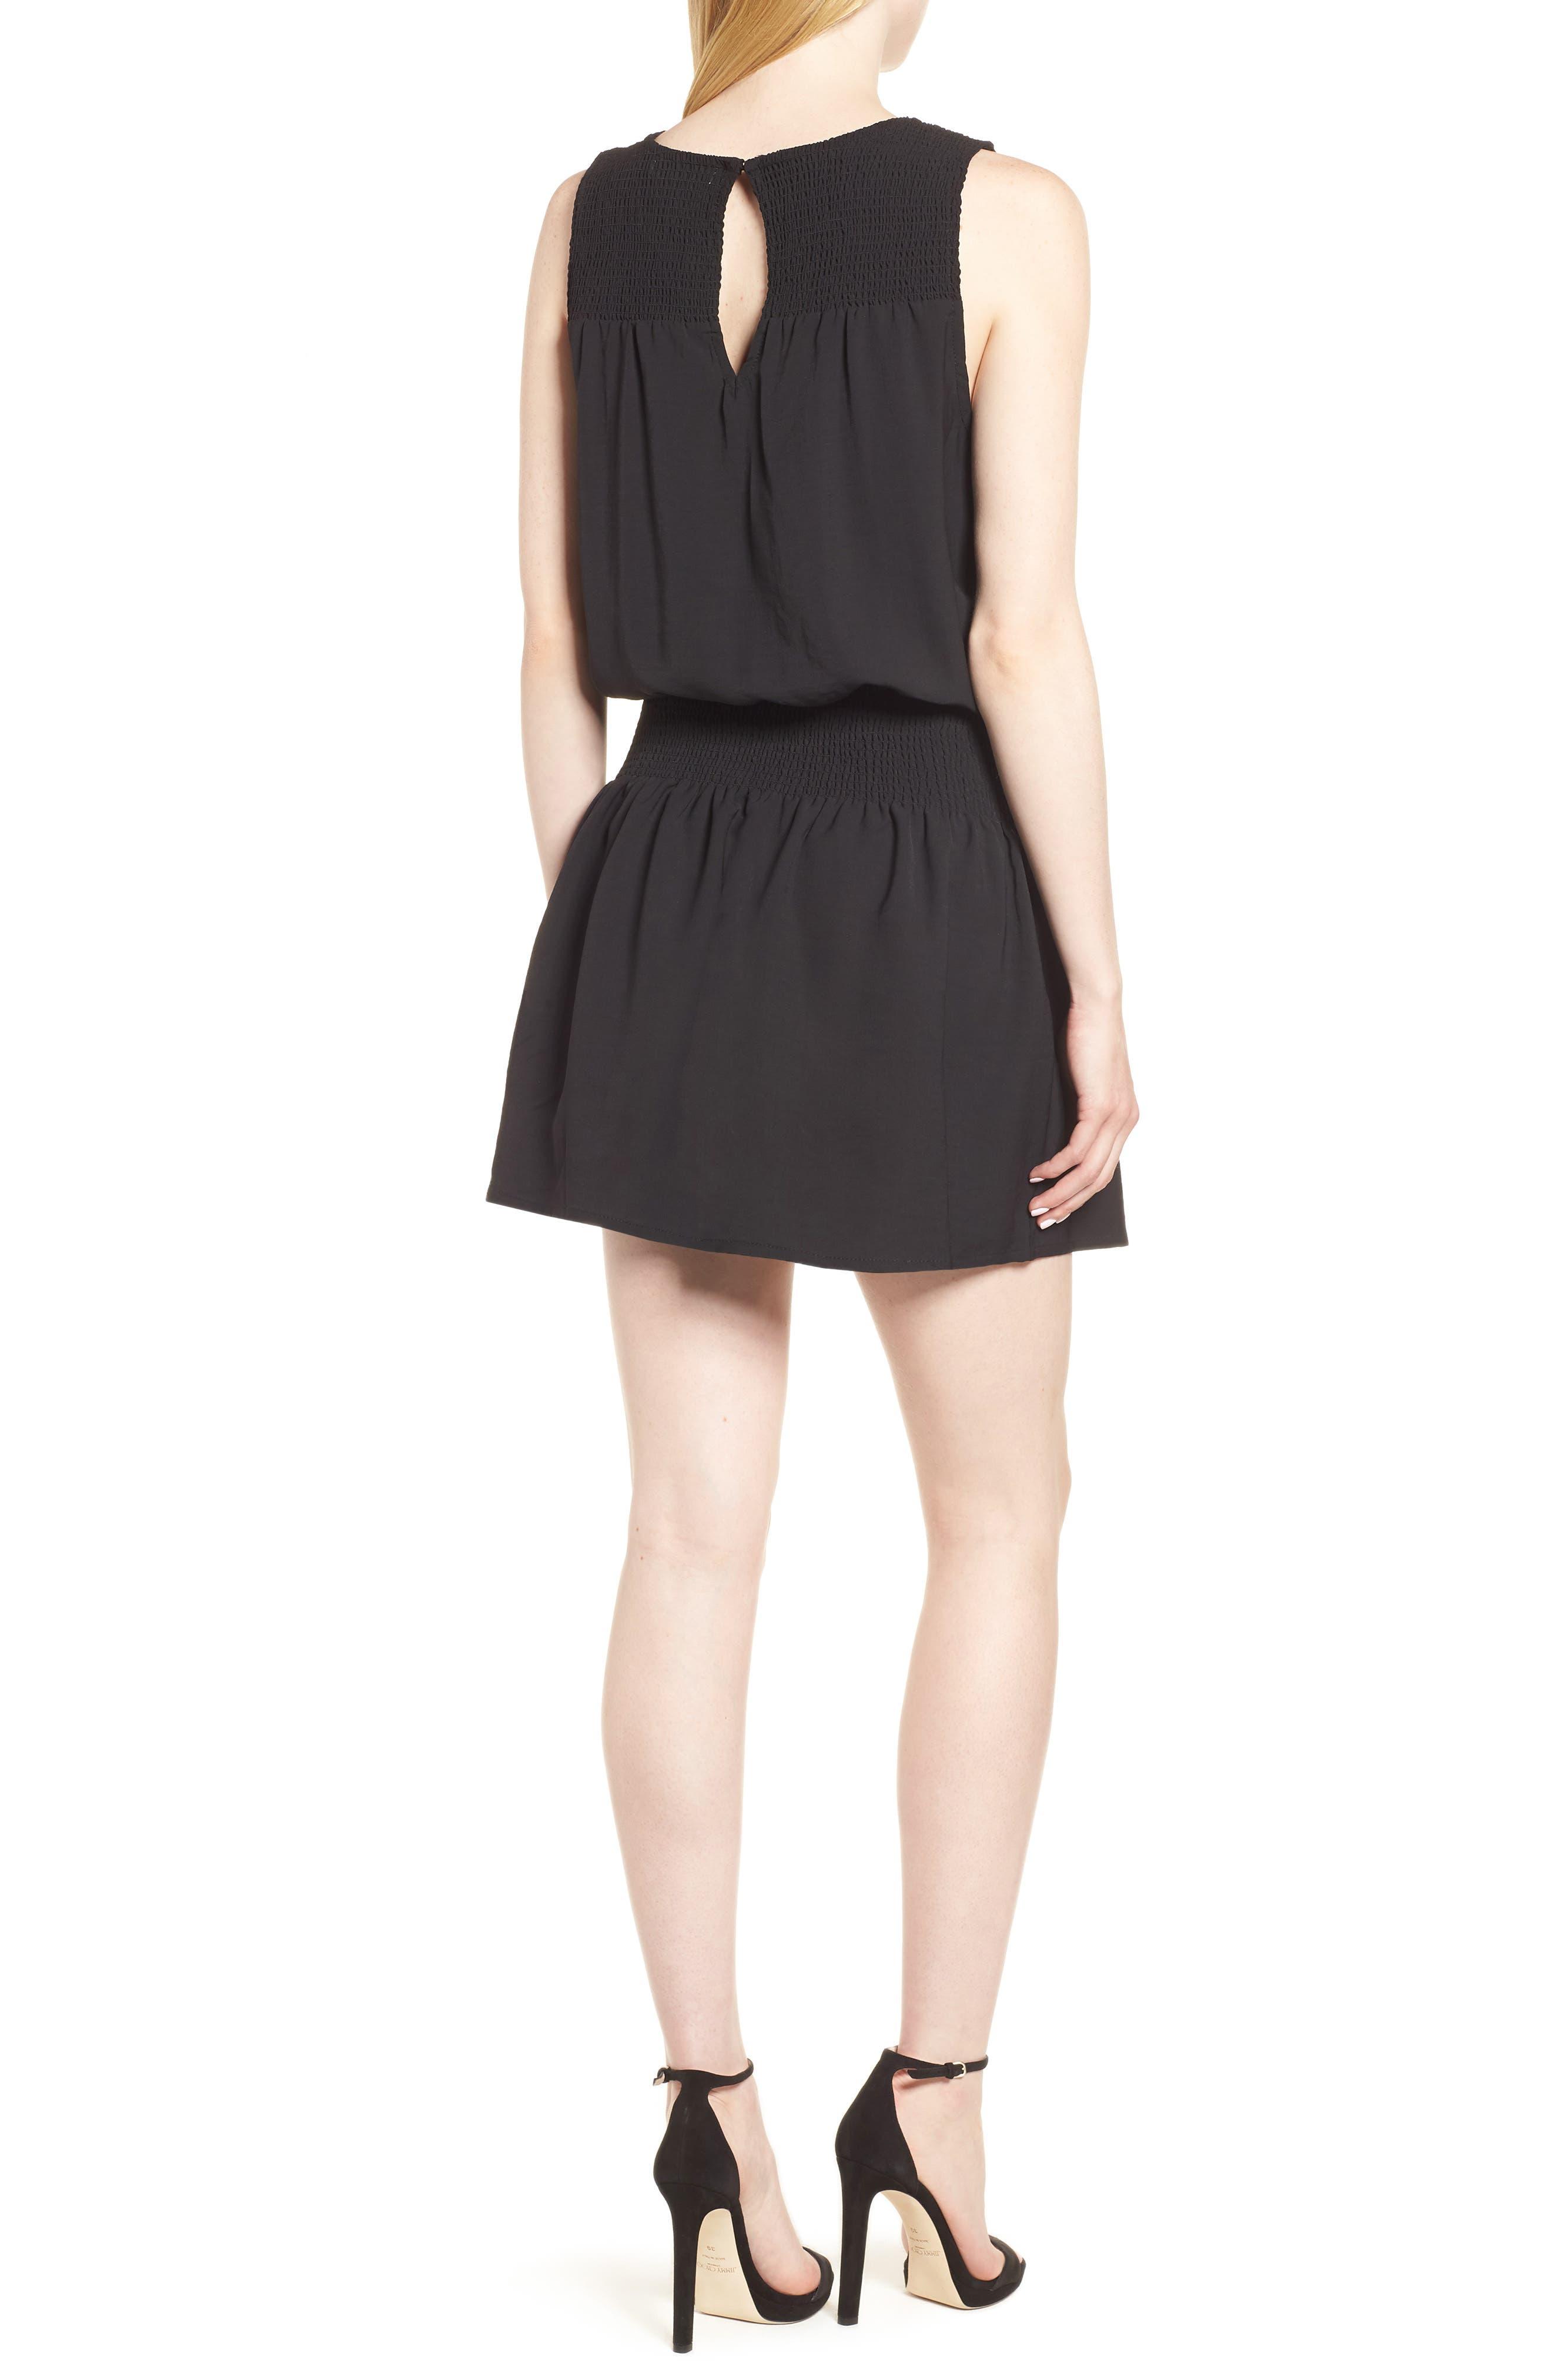 Bishop + Young Smocked Dress,                             Alternate thumbnail 2, color,                             Black